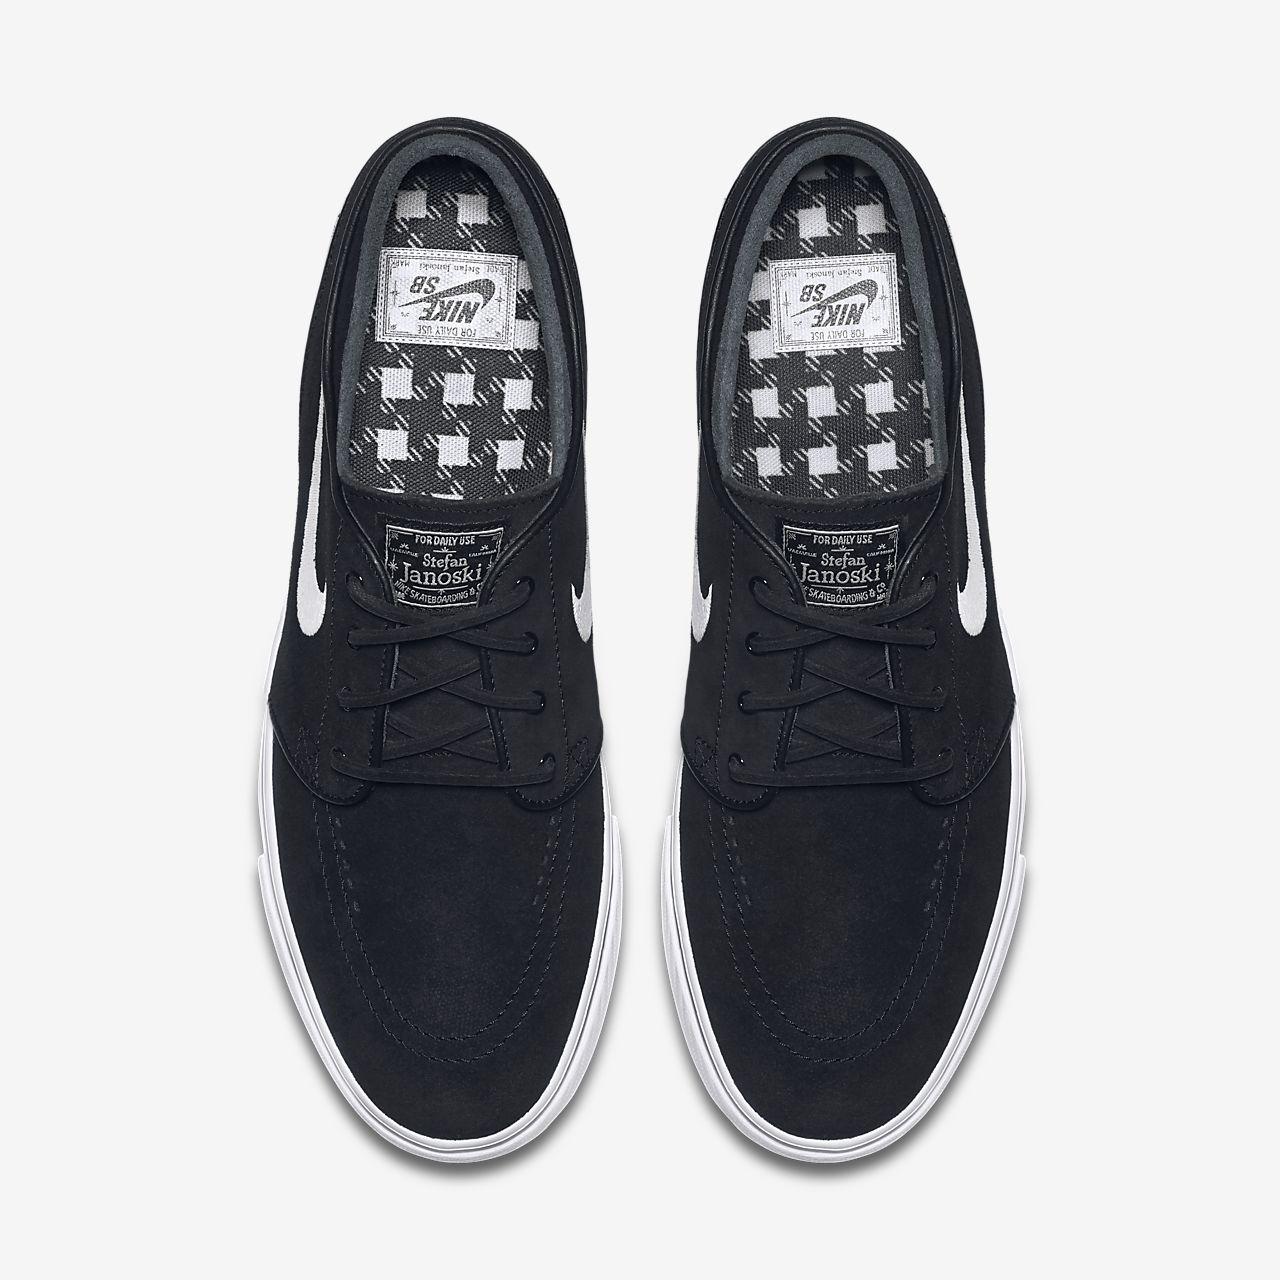 nueva apariencia la mejor actitud mejor precio Nike SB Zoom Stefan Janoski OG Men's Skate Shoe